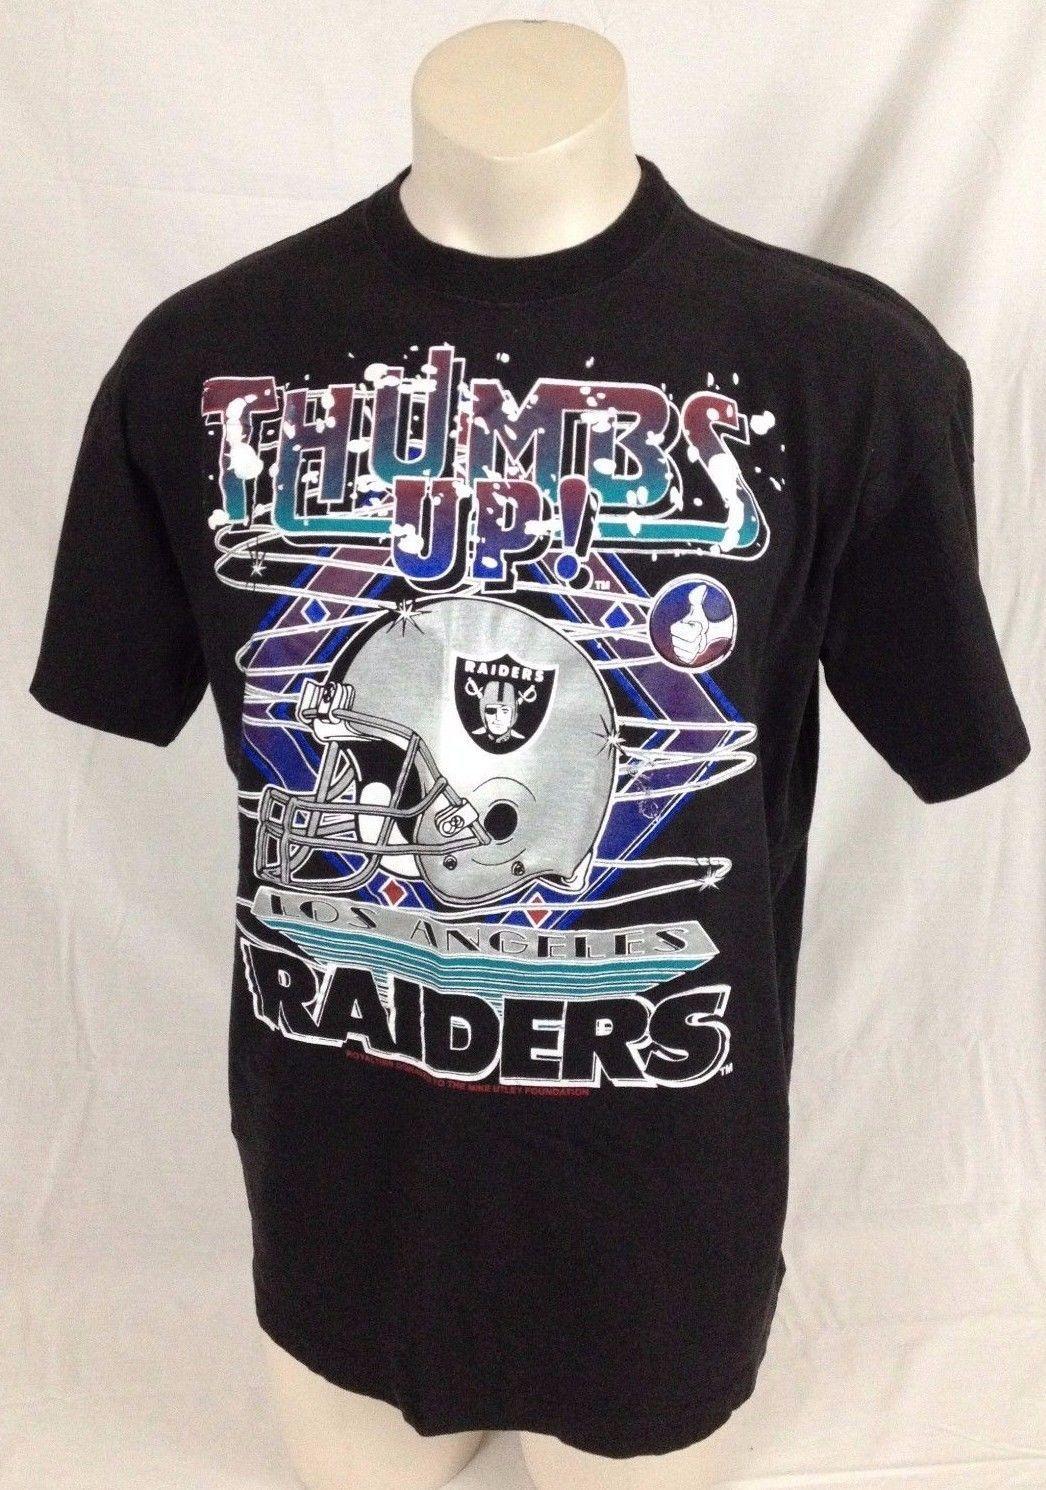 3b801582 S l1600. S l1600. Previous. Vintage 90s Los Angeles Raiders NFL Black  T-Shirt